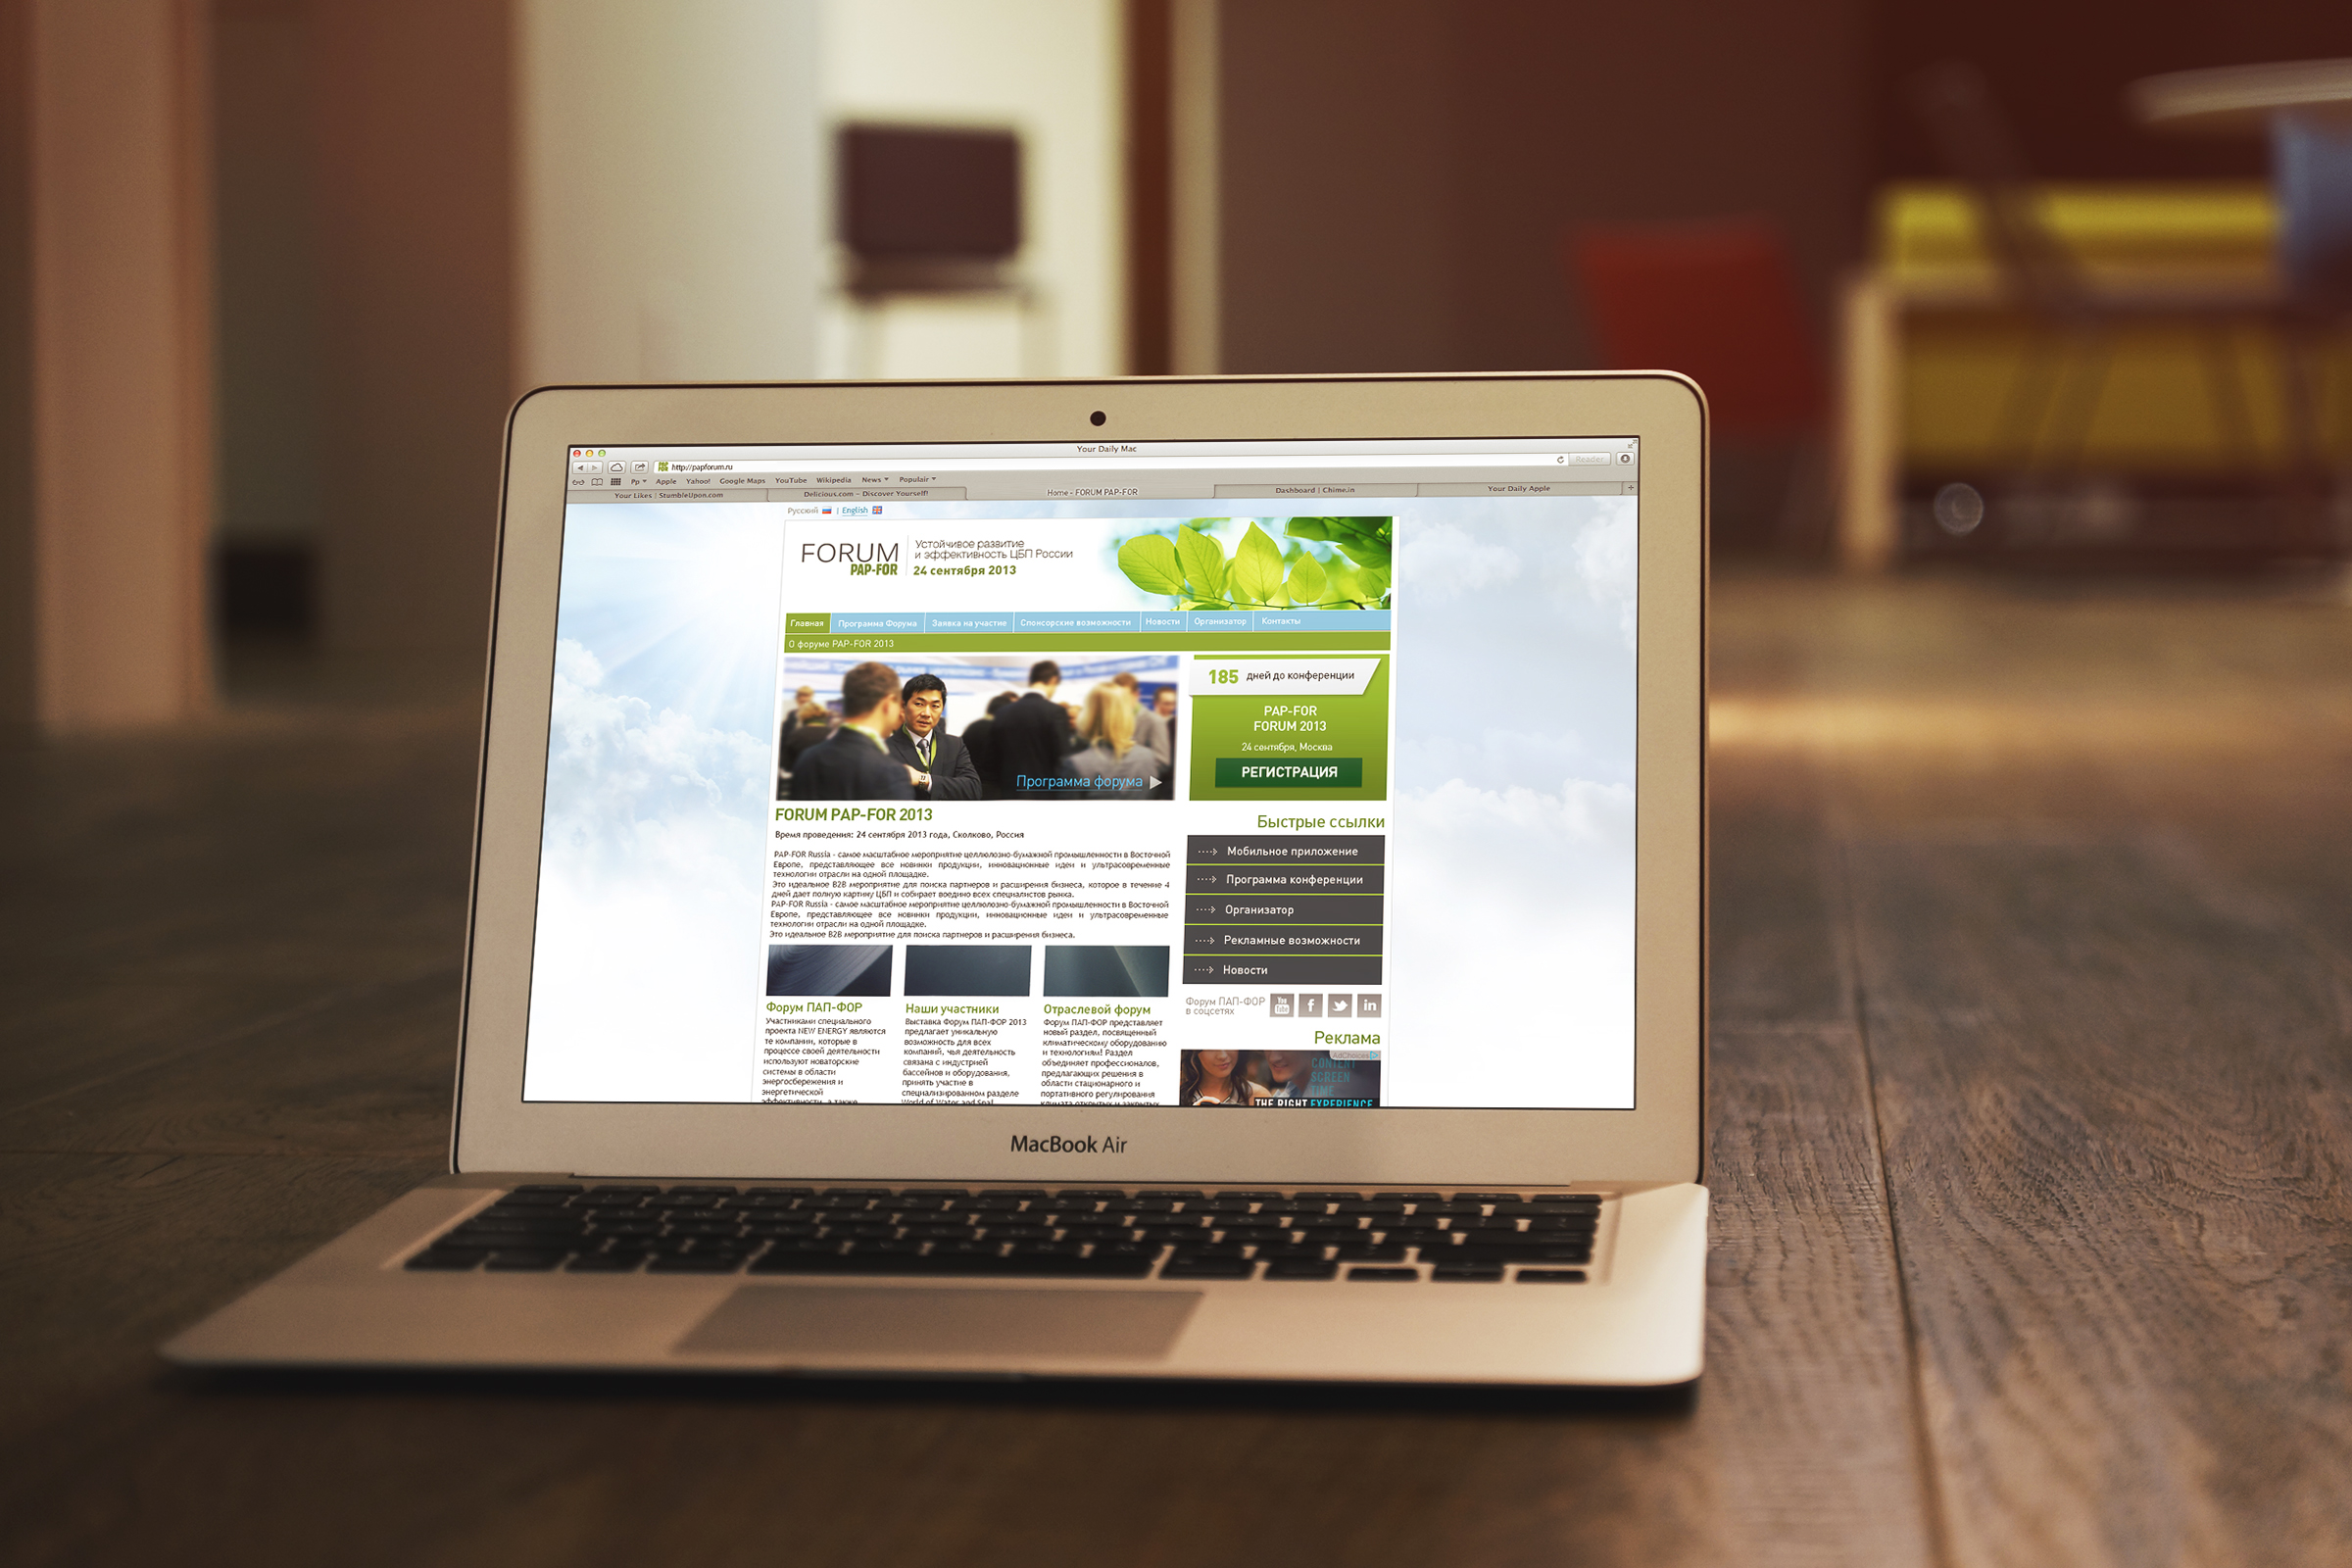 PAP-FOR Forum website